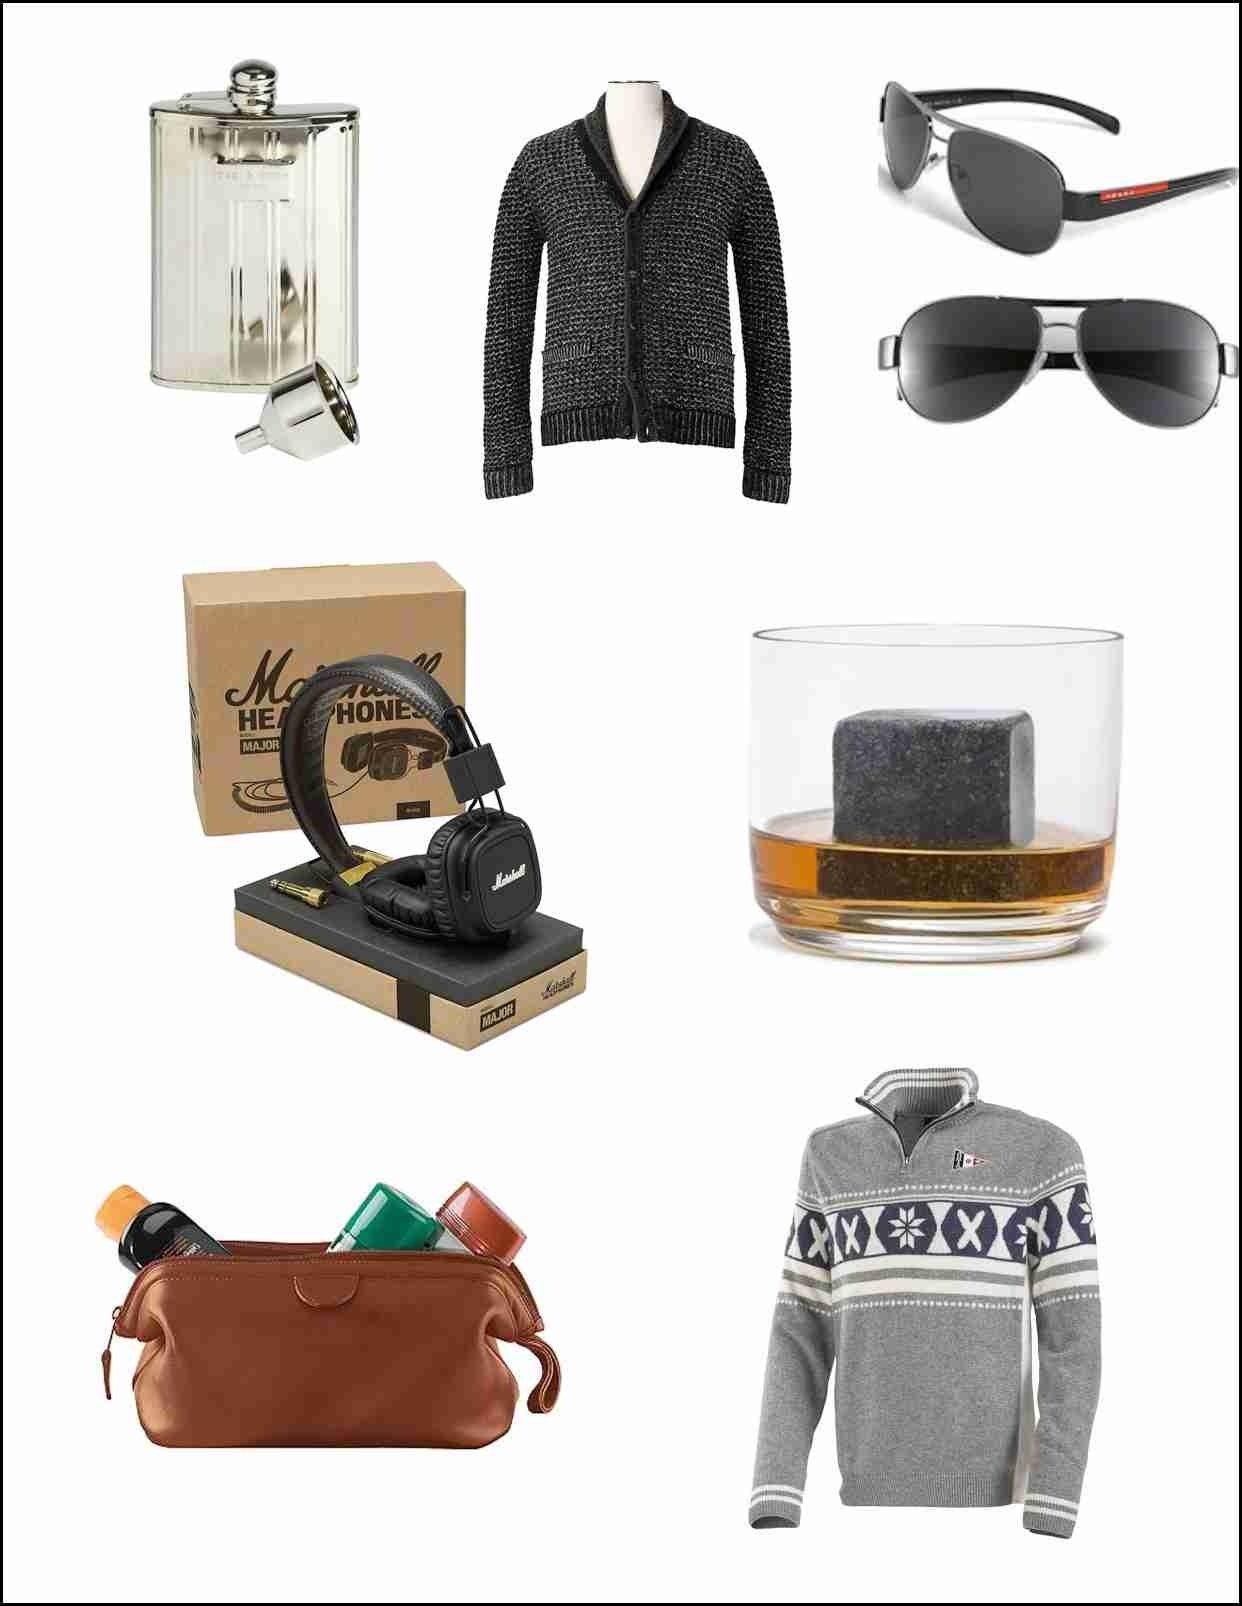 10 Stylish 3Rd Wedding Anniversary Gift Ideas For Him 3rd wedding anniversary gift ideas for him evgplc 1 2020